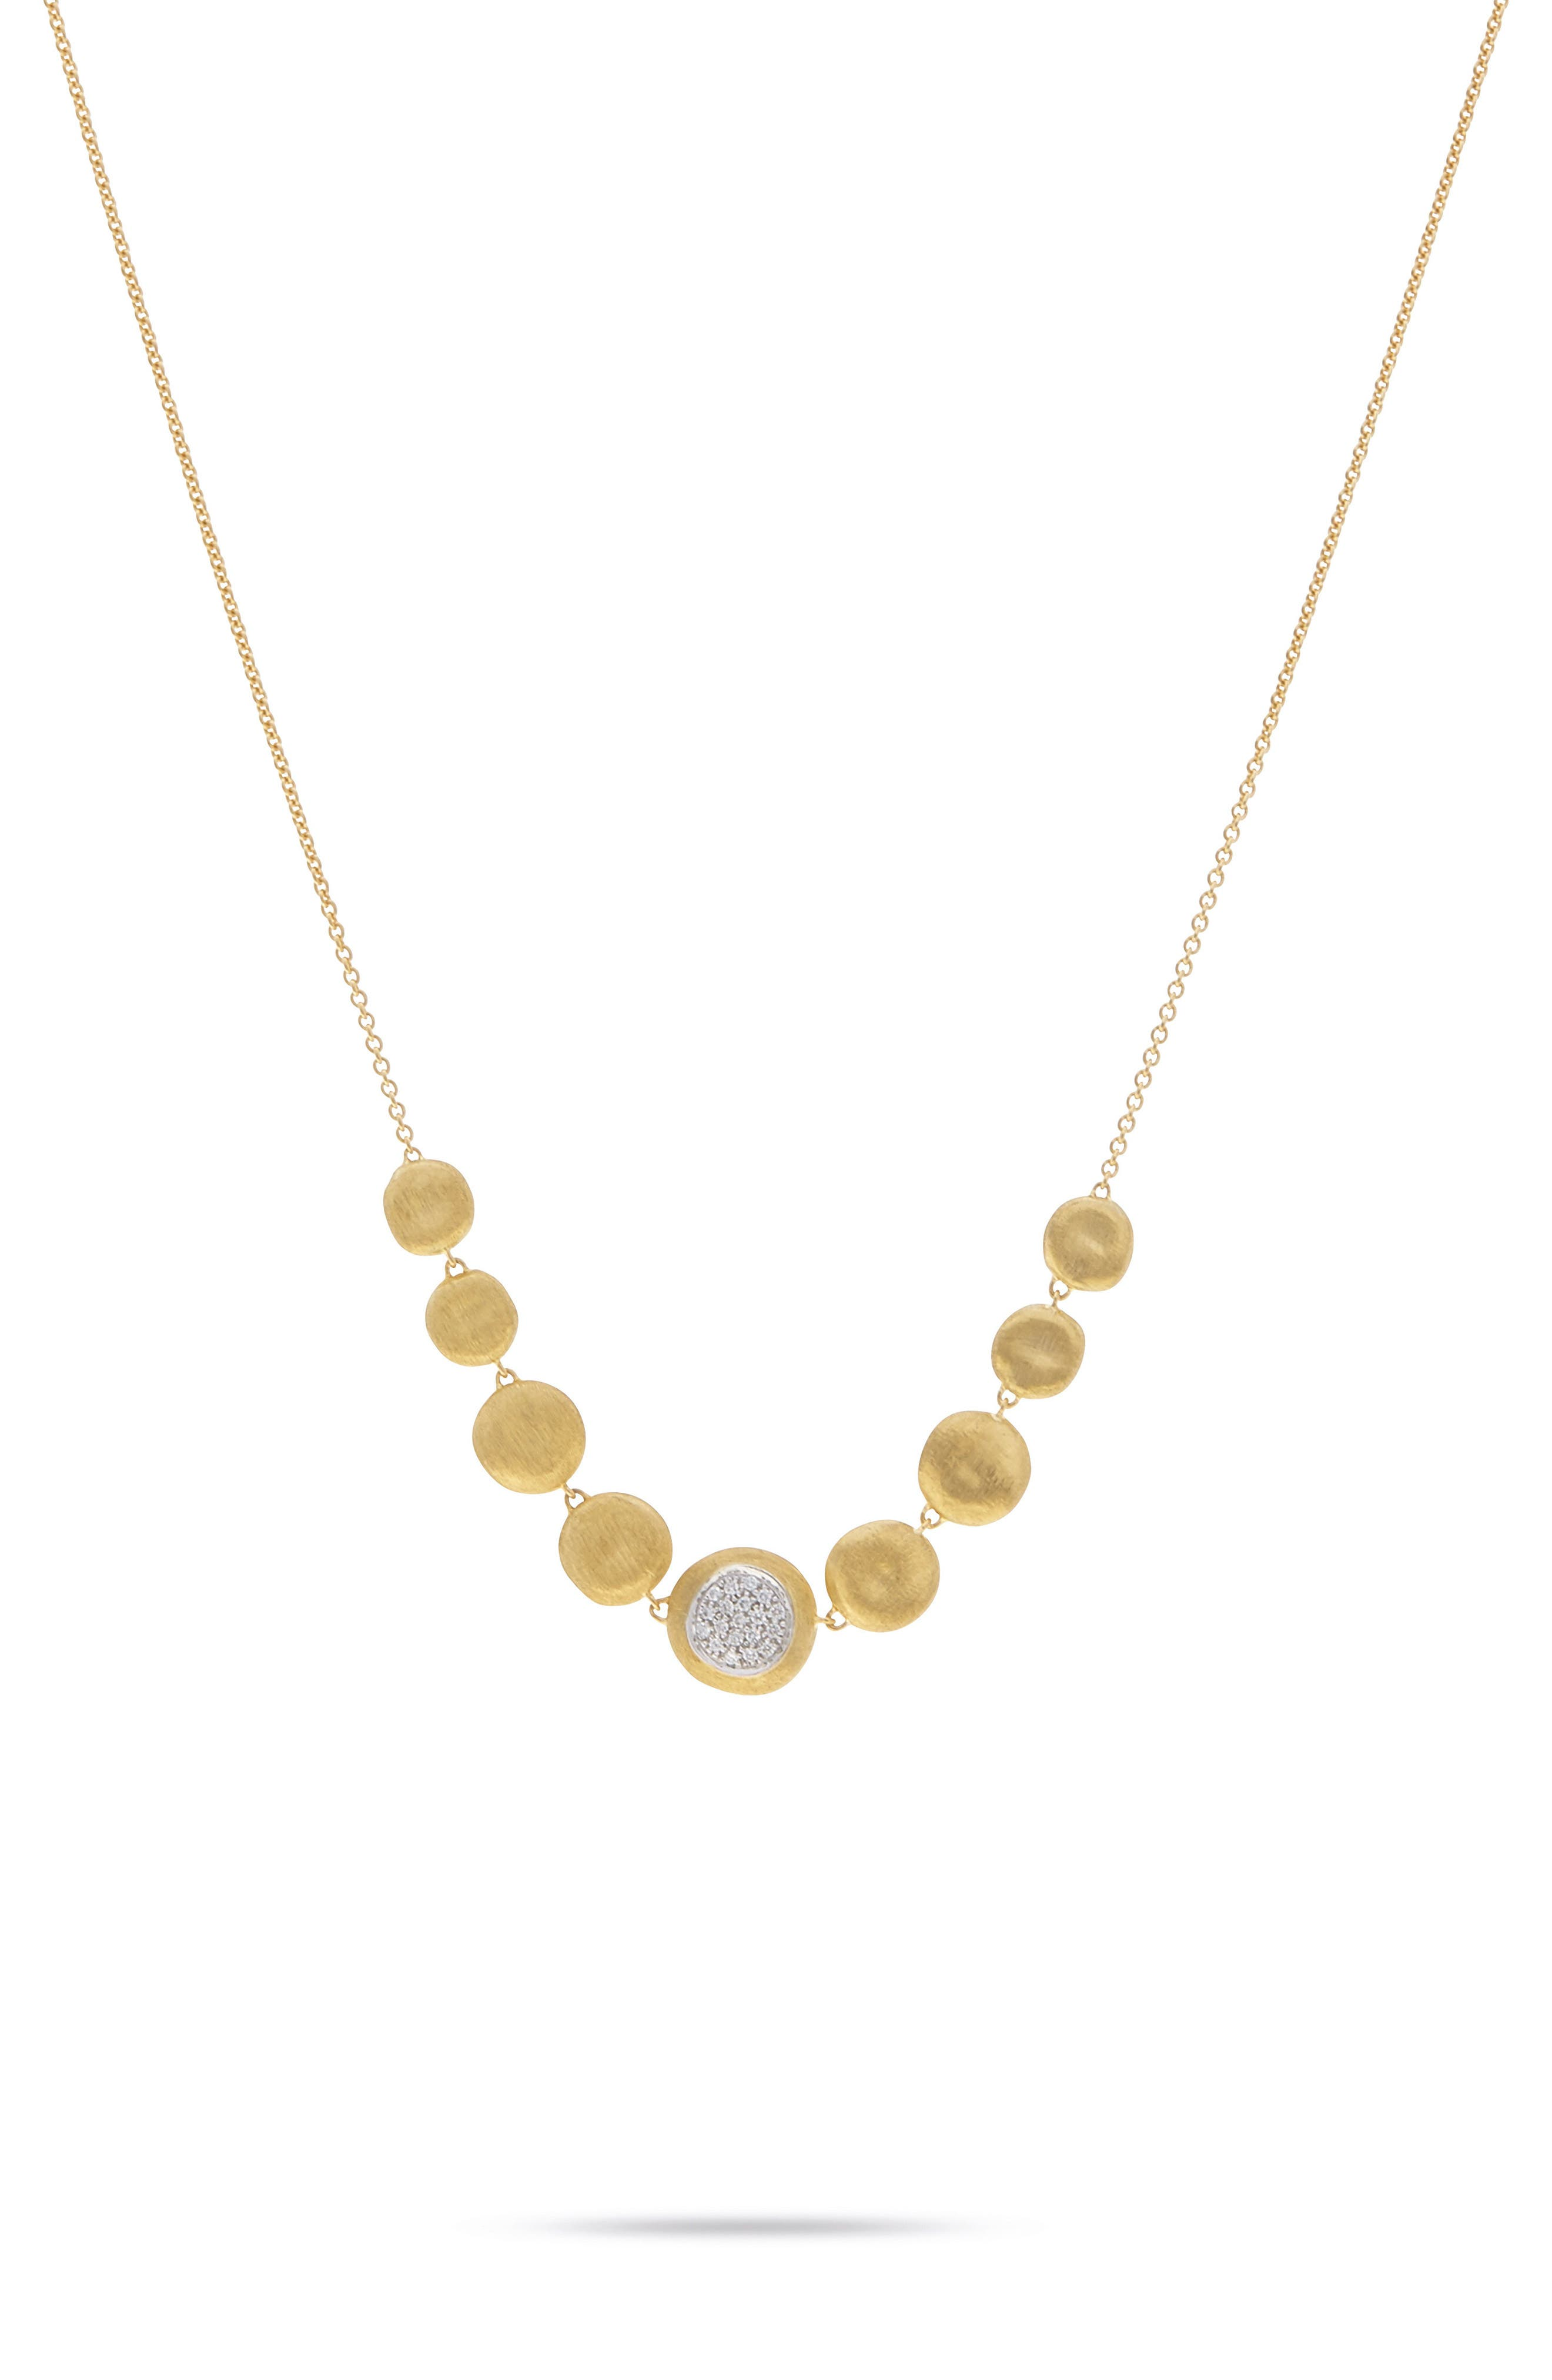 Marco Bicego Jaipur 18K Gold & Diamond Necklace